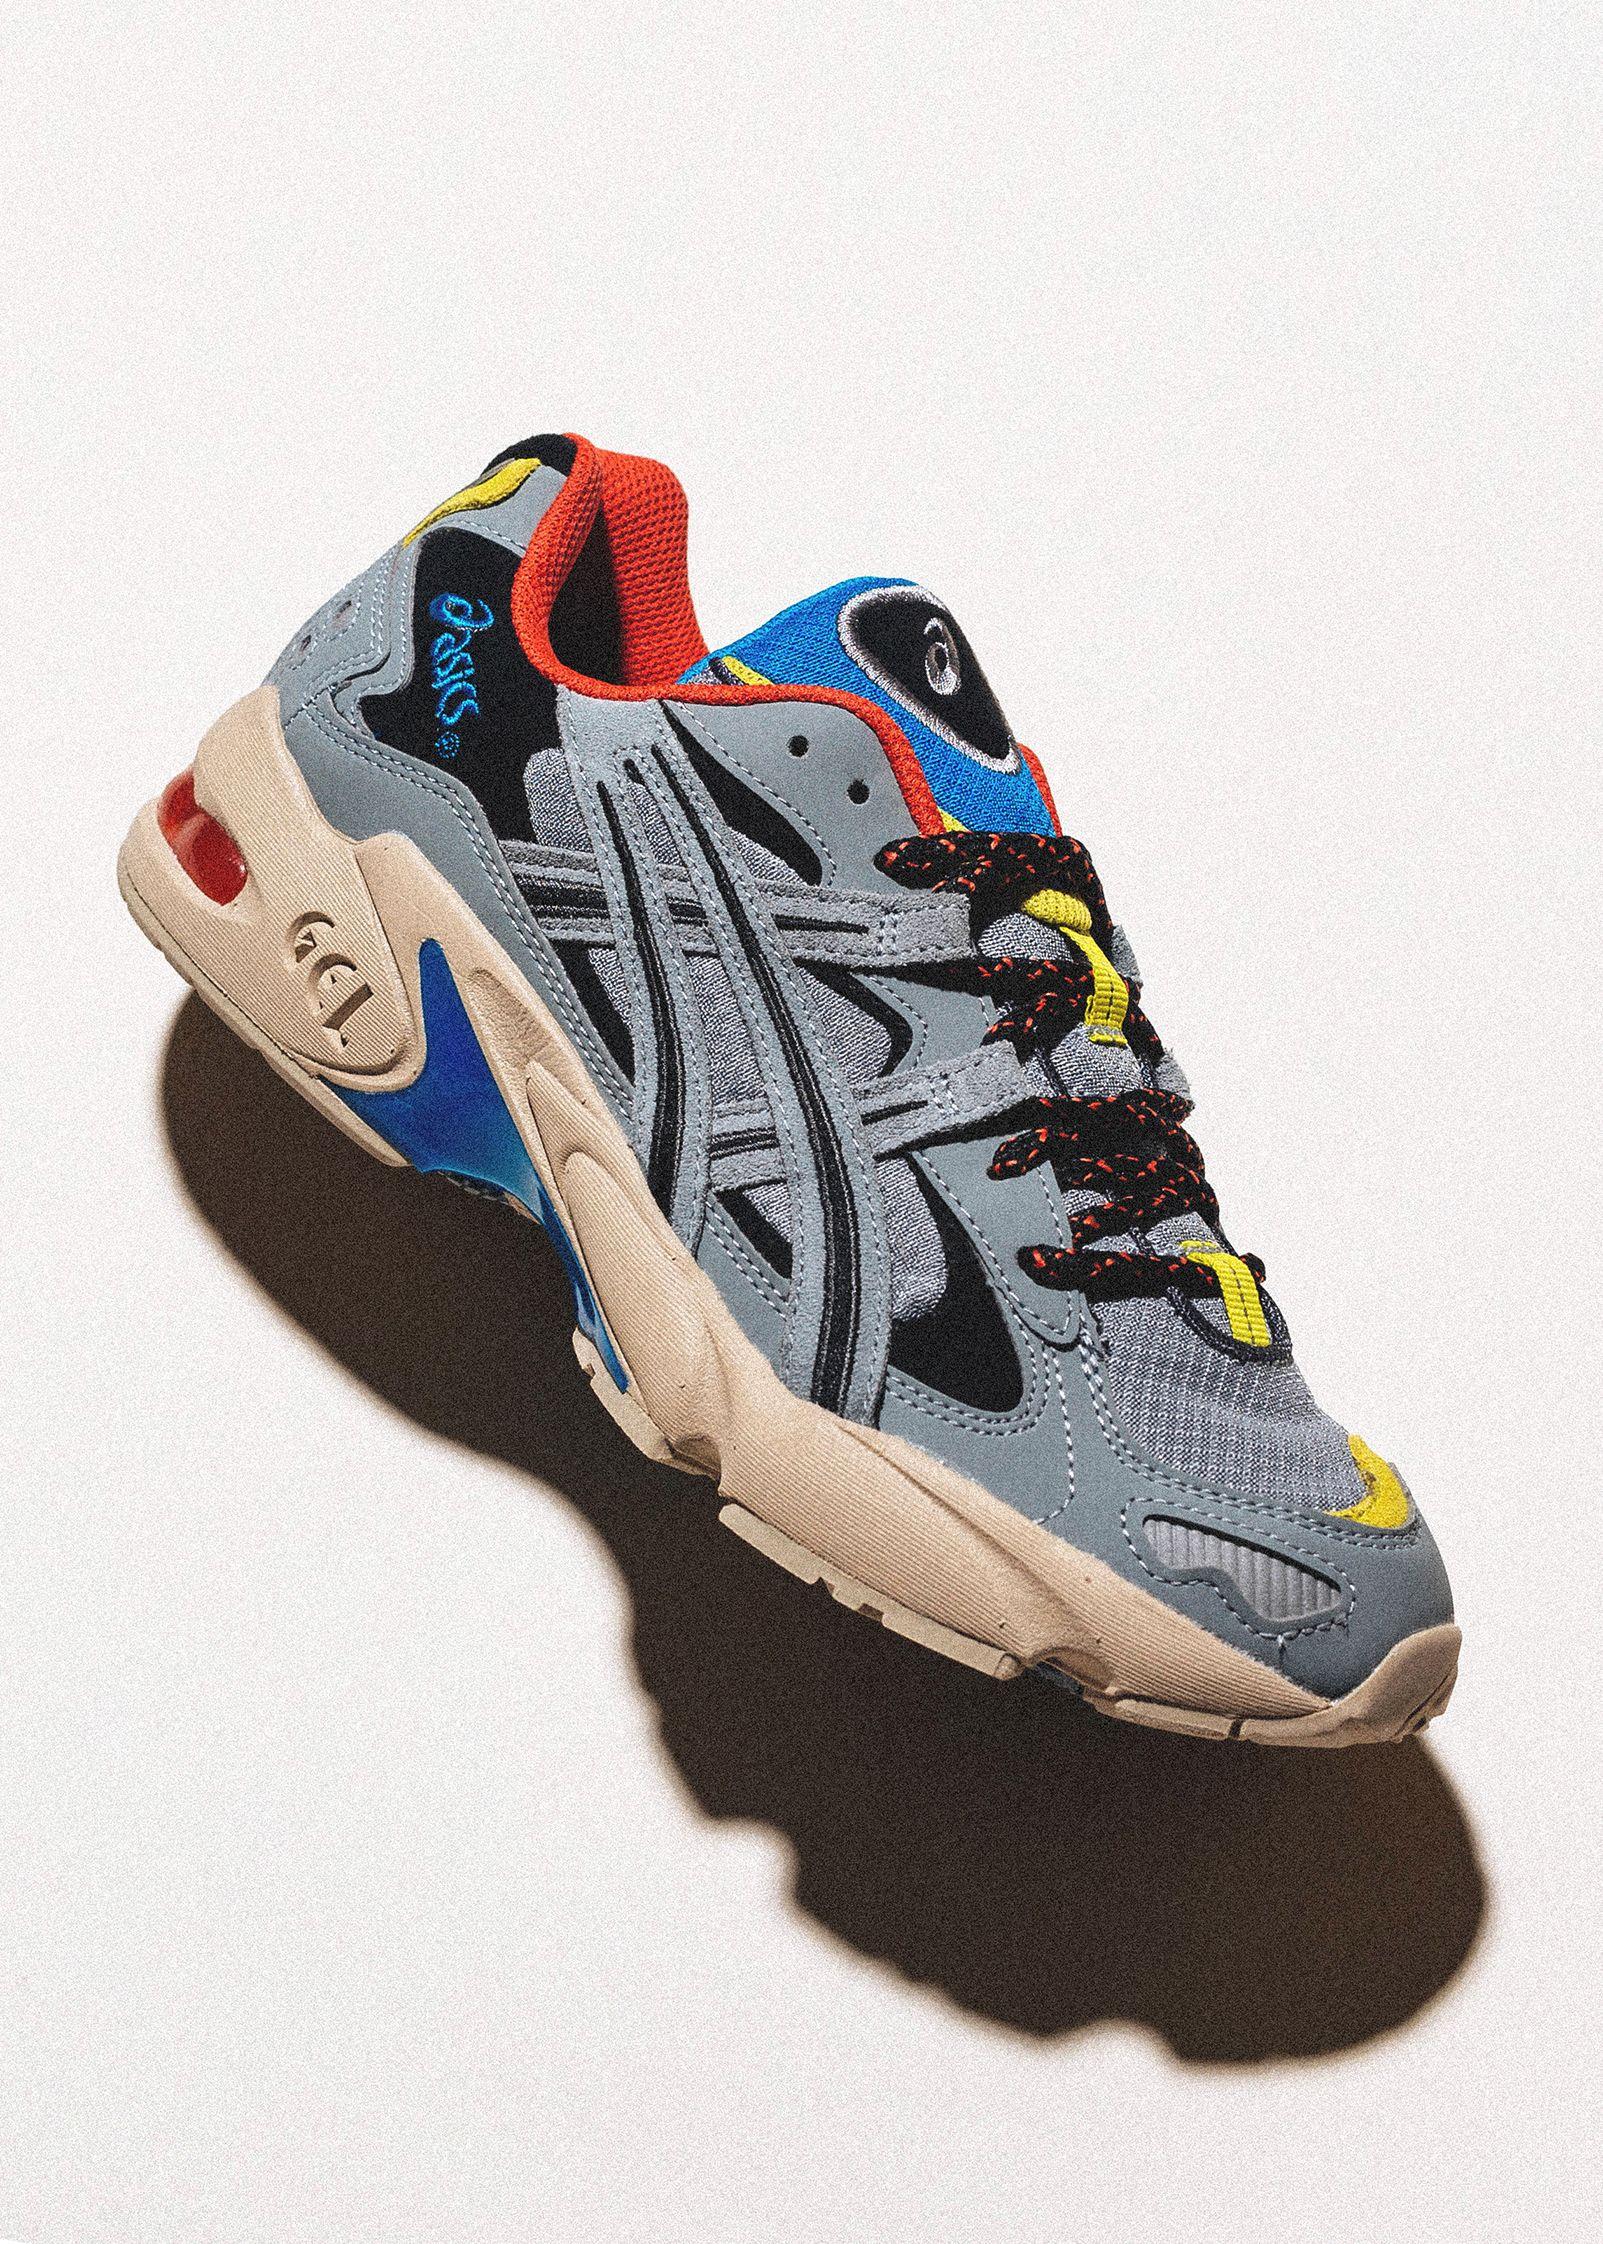 Asics Gel Kayano 5 Og Sneakers Men Sneakers Shoes Mens